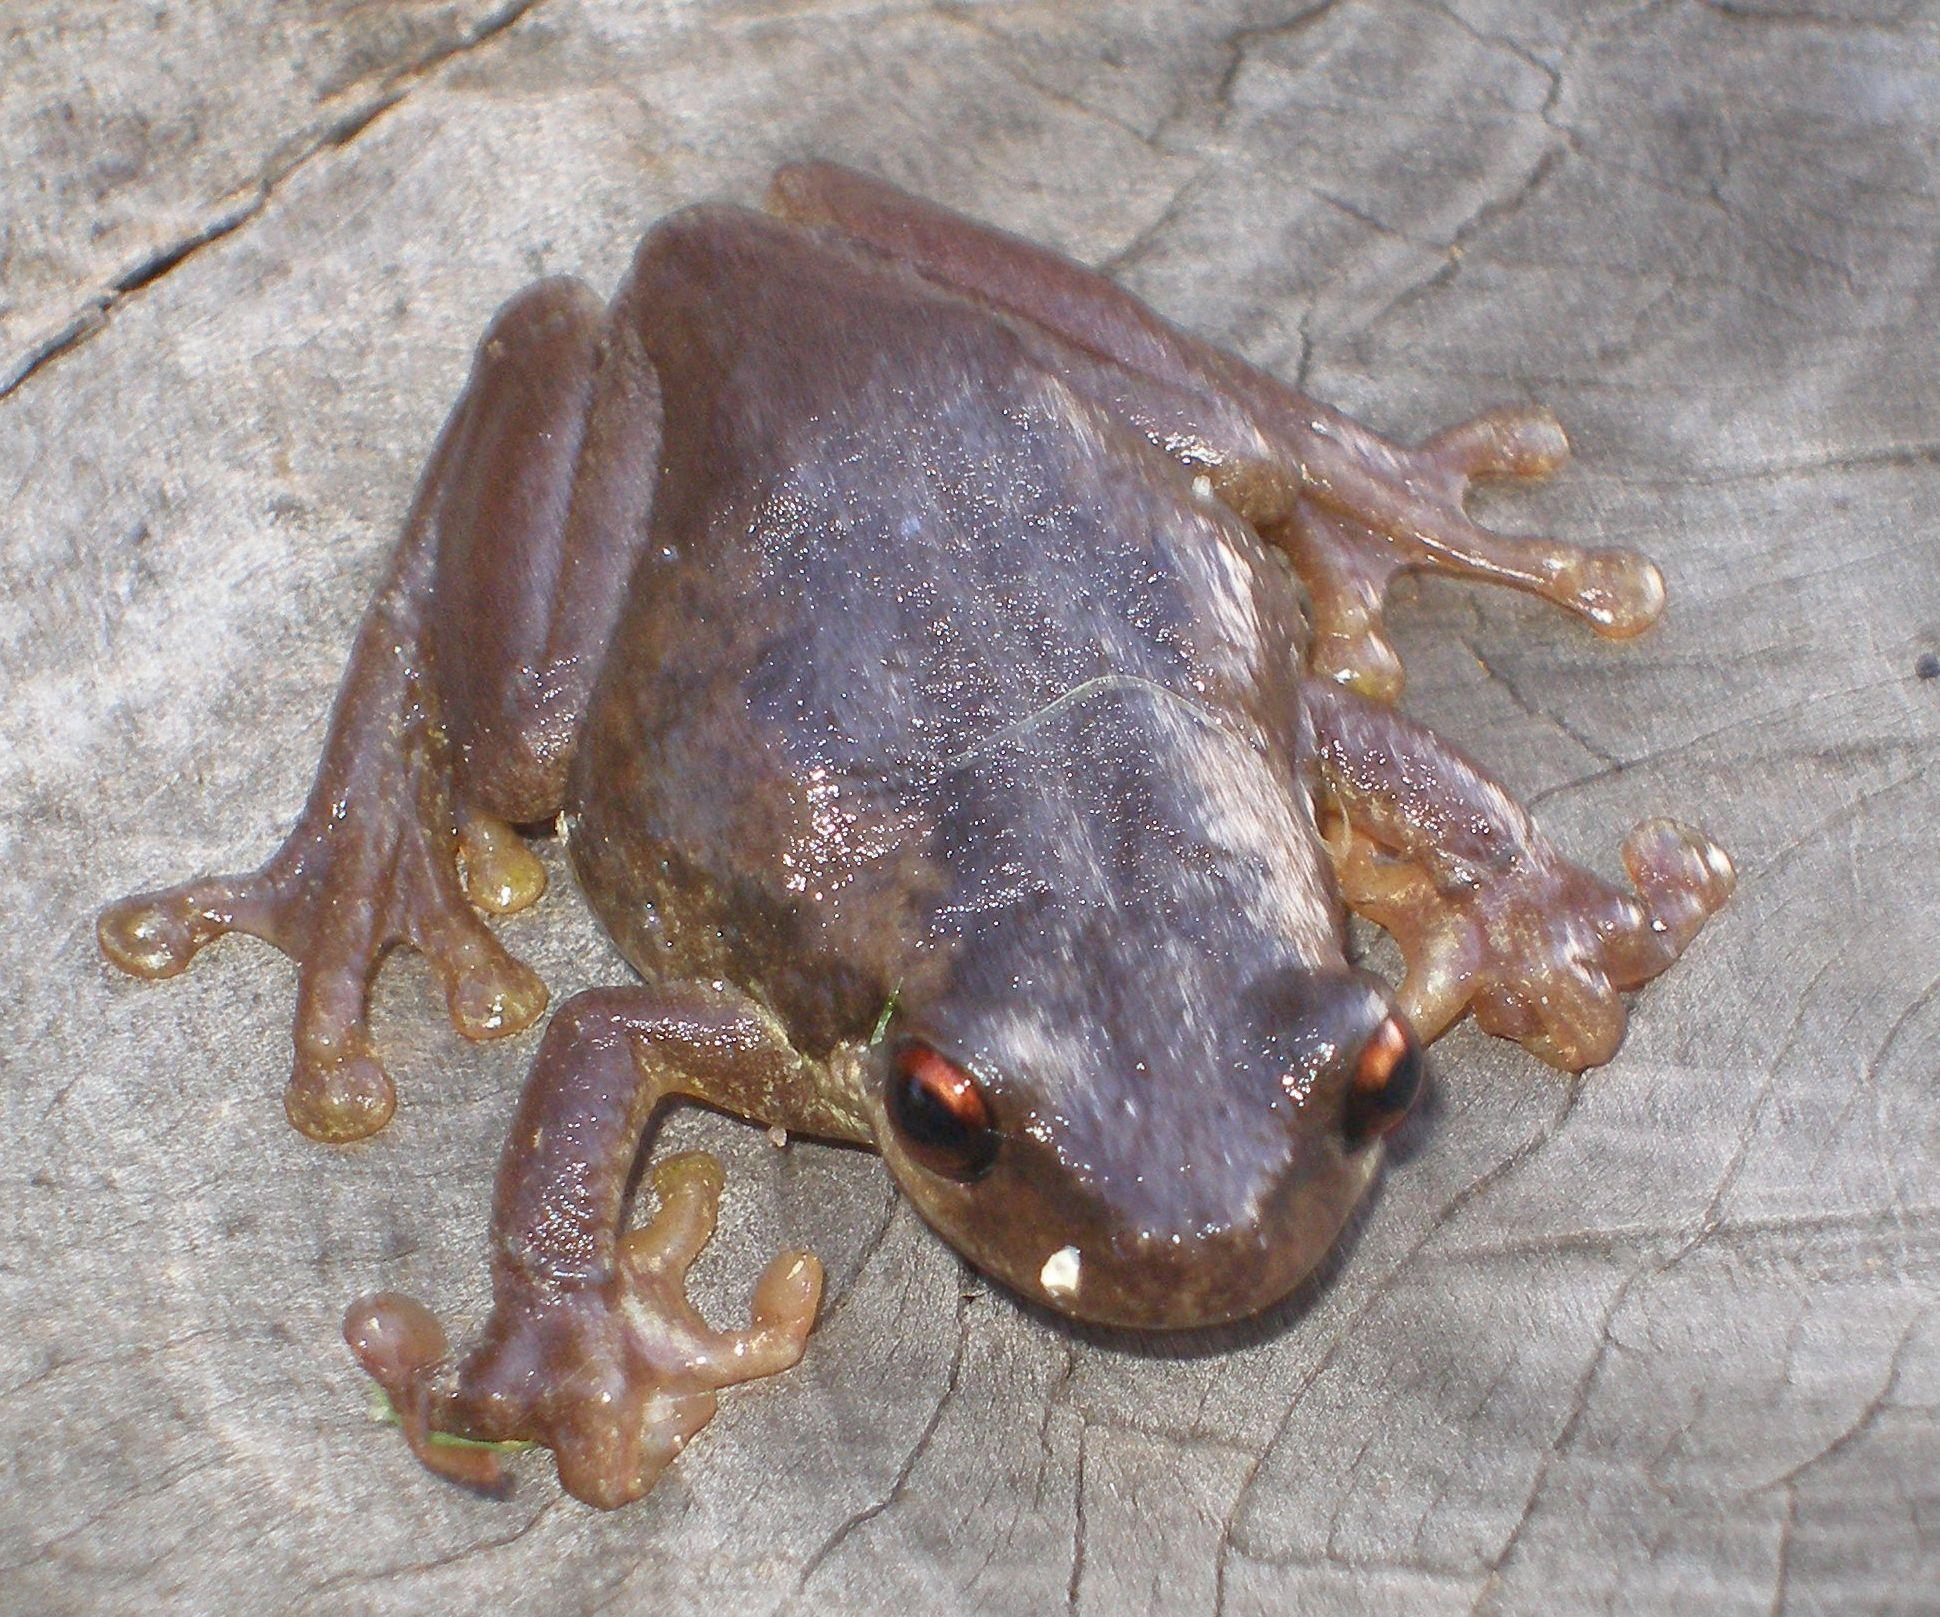 BleatingTreefrog